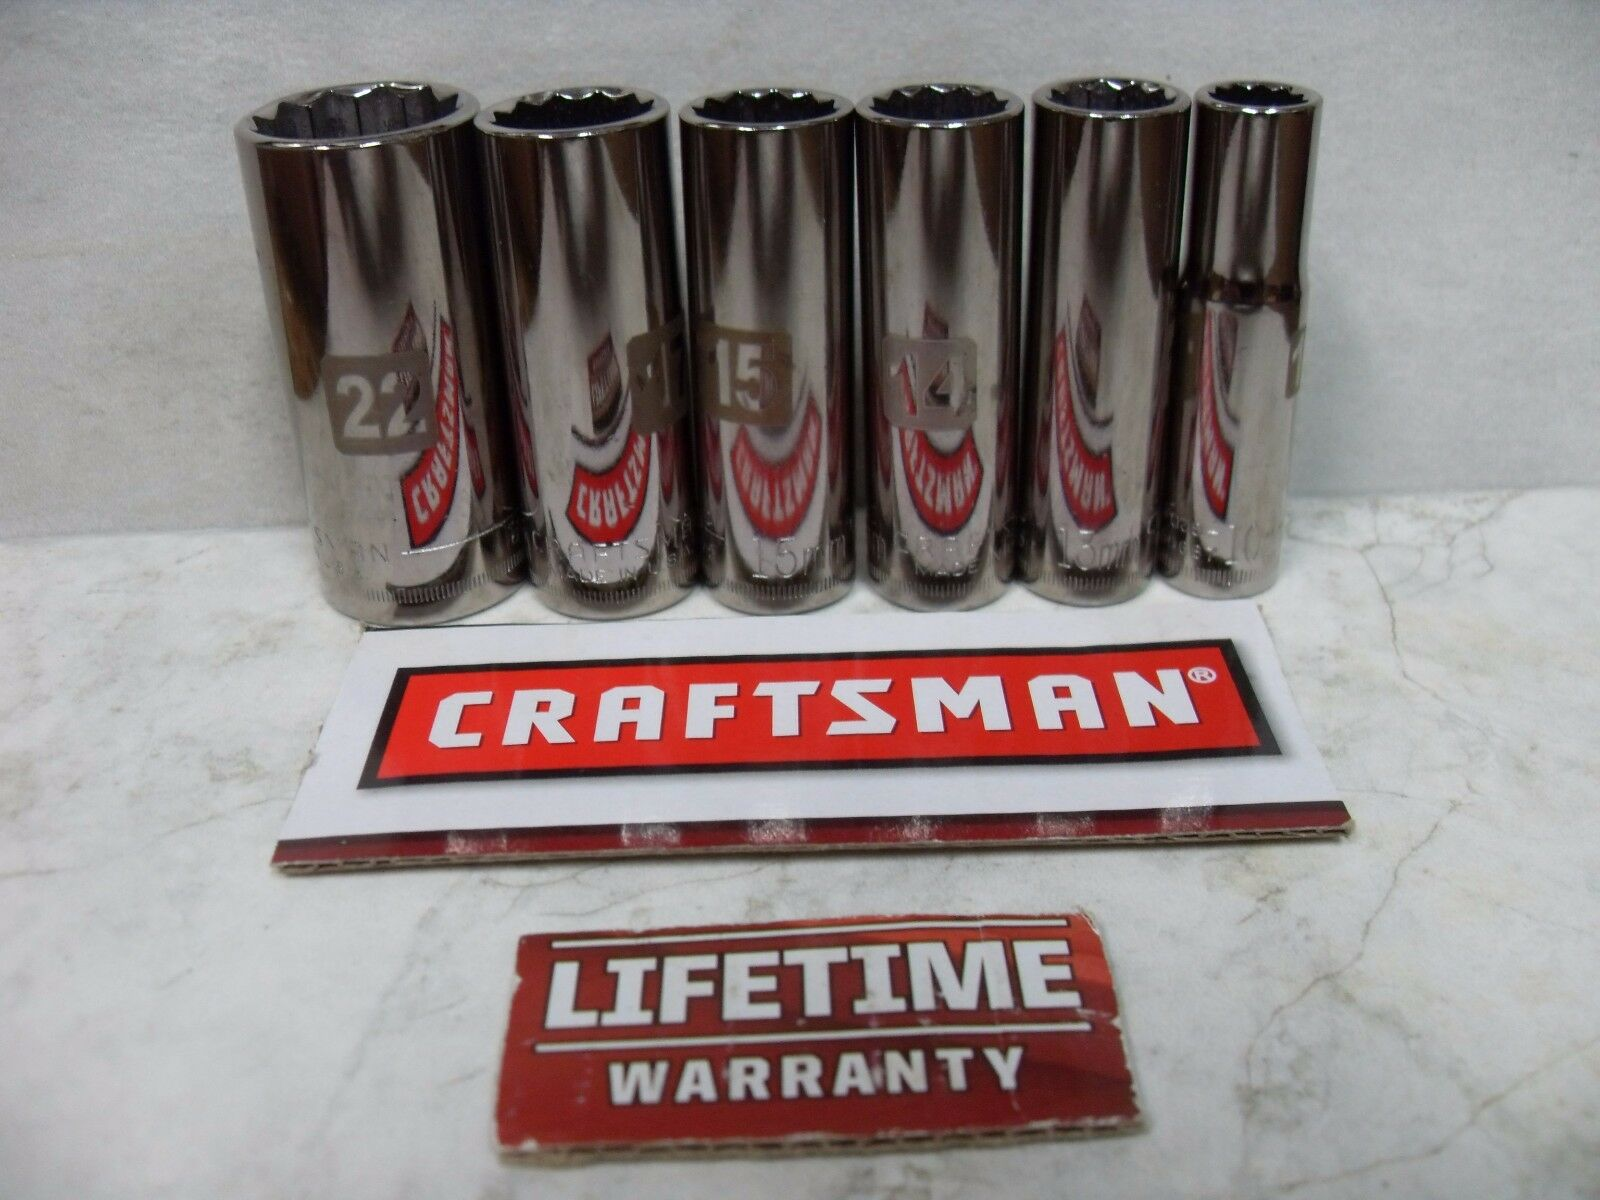 "NEW CRAFTSMAN 3/8"" 12 PT POINT METRIC DEEP SOCKET TOOLS USA"